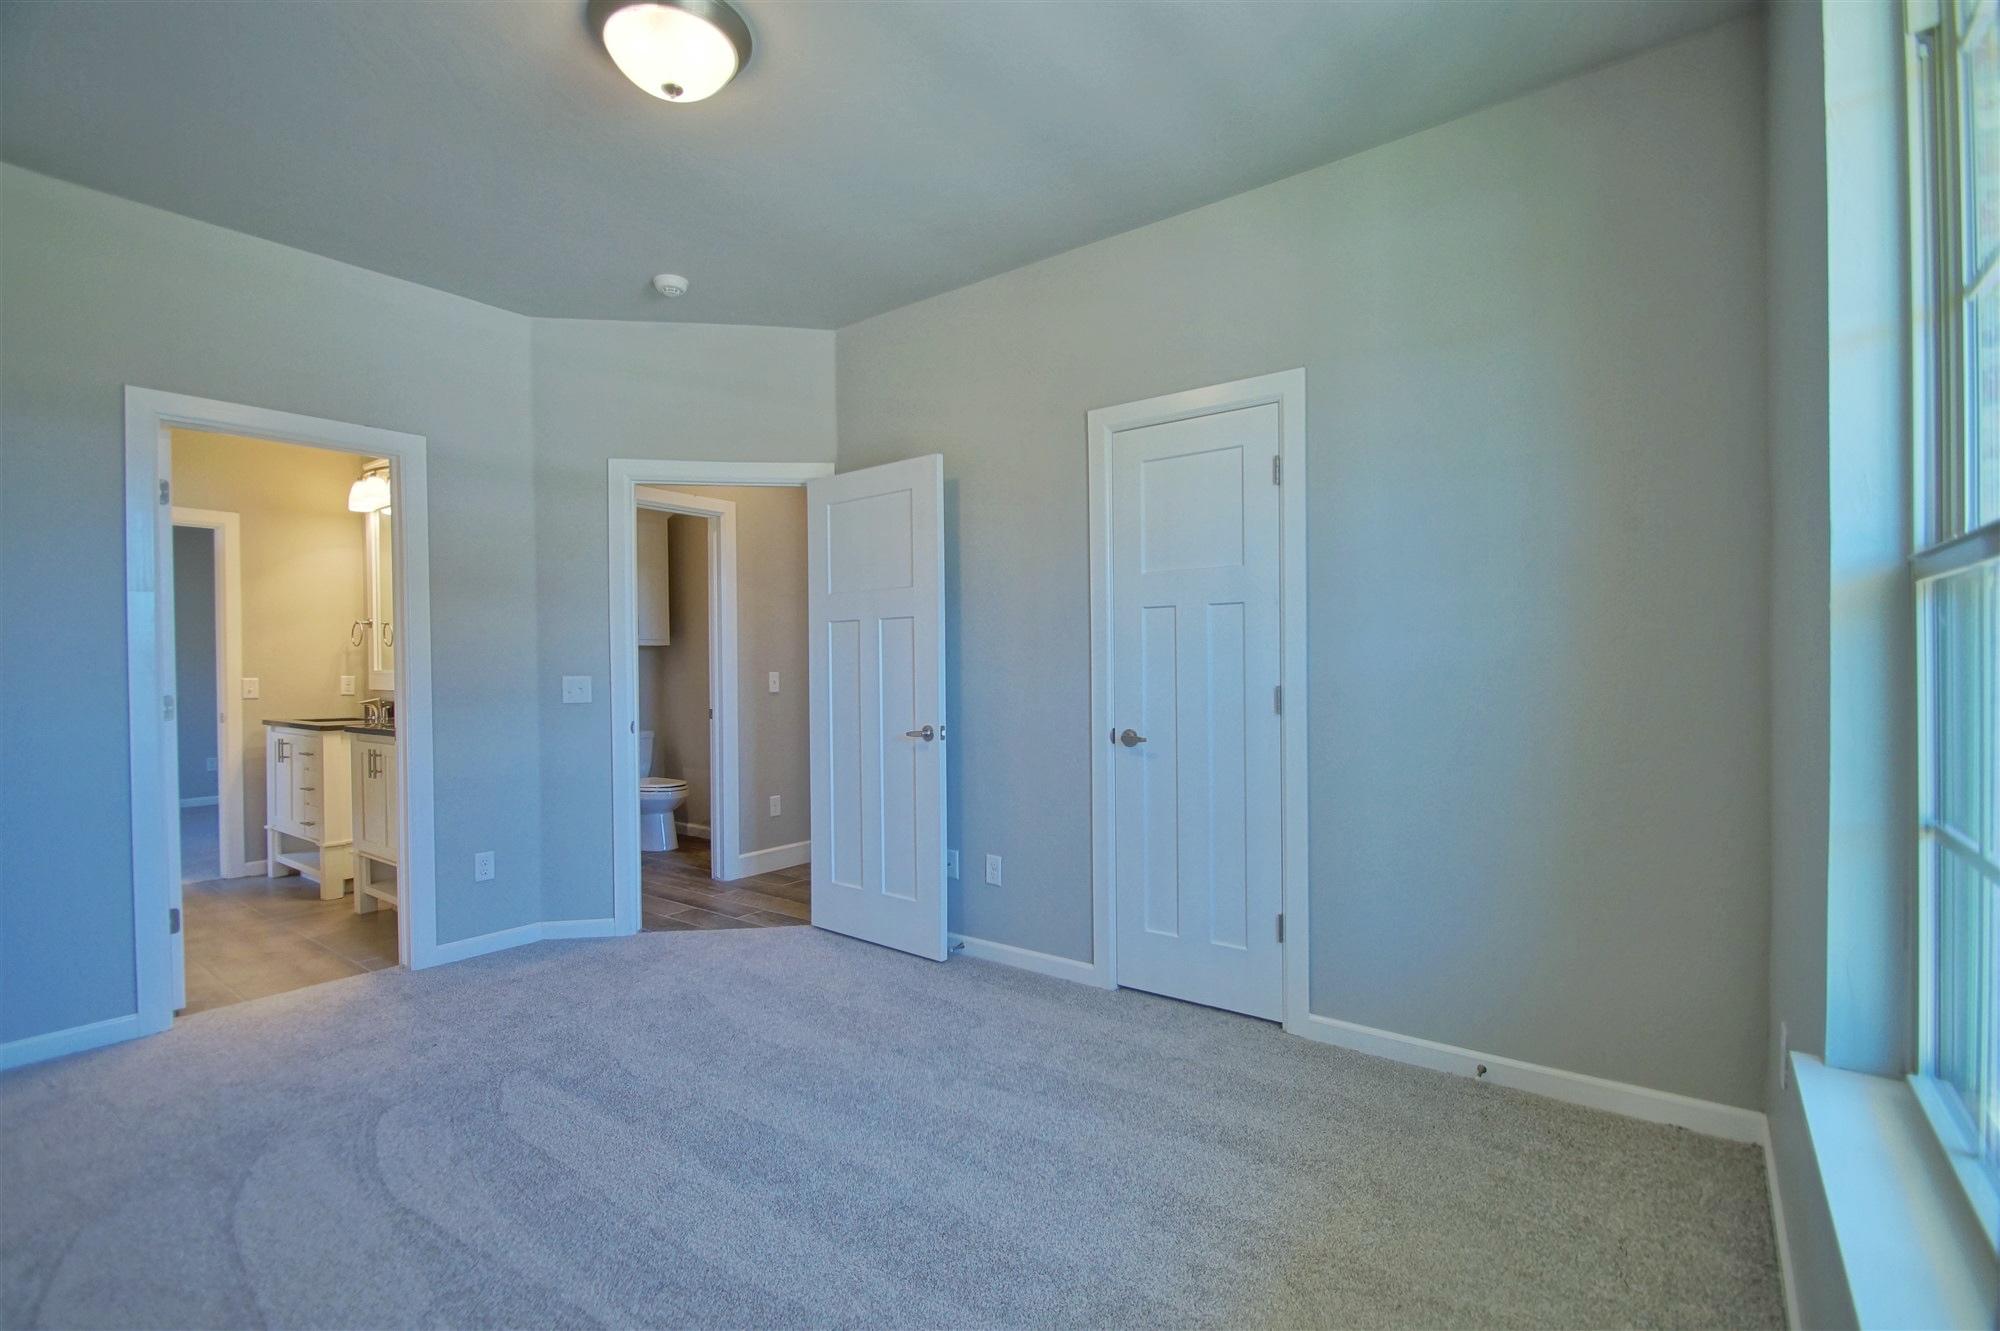 25 - Bedroom.jpg